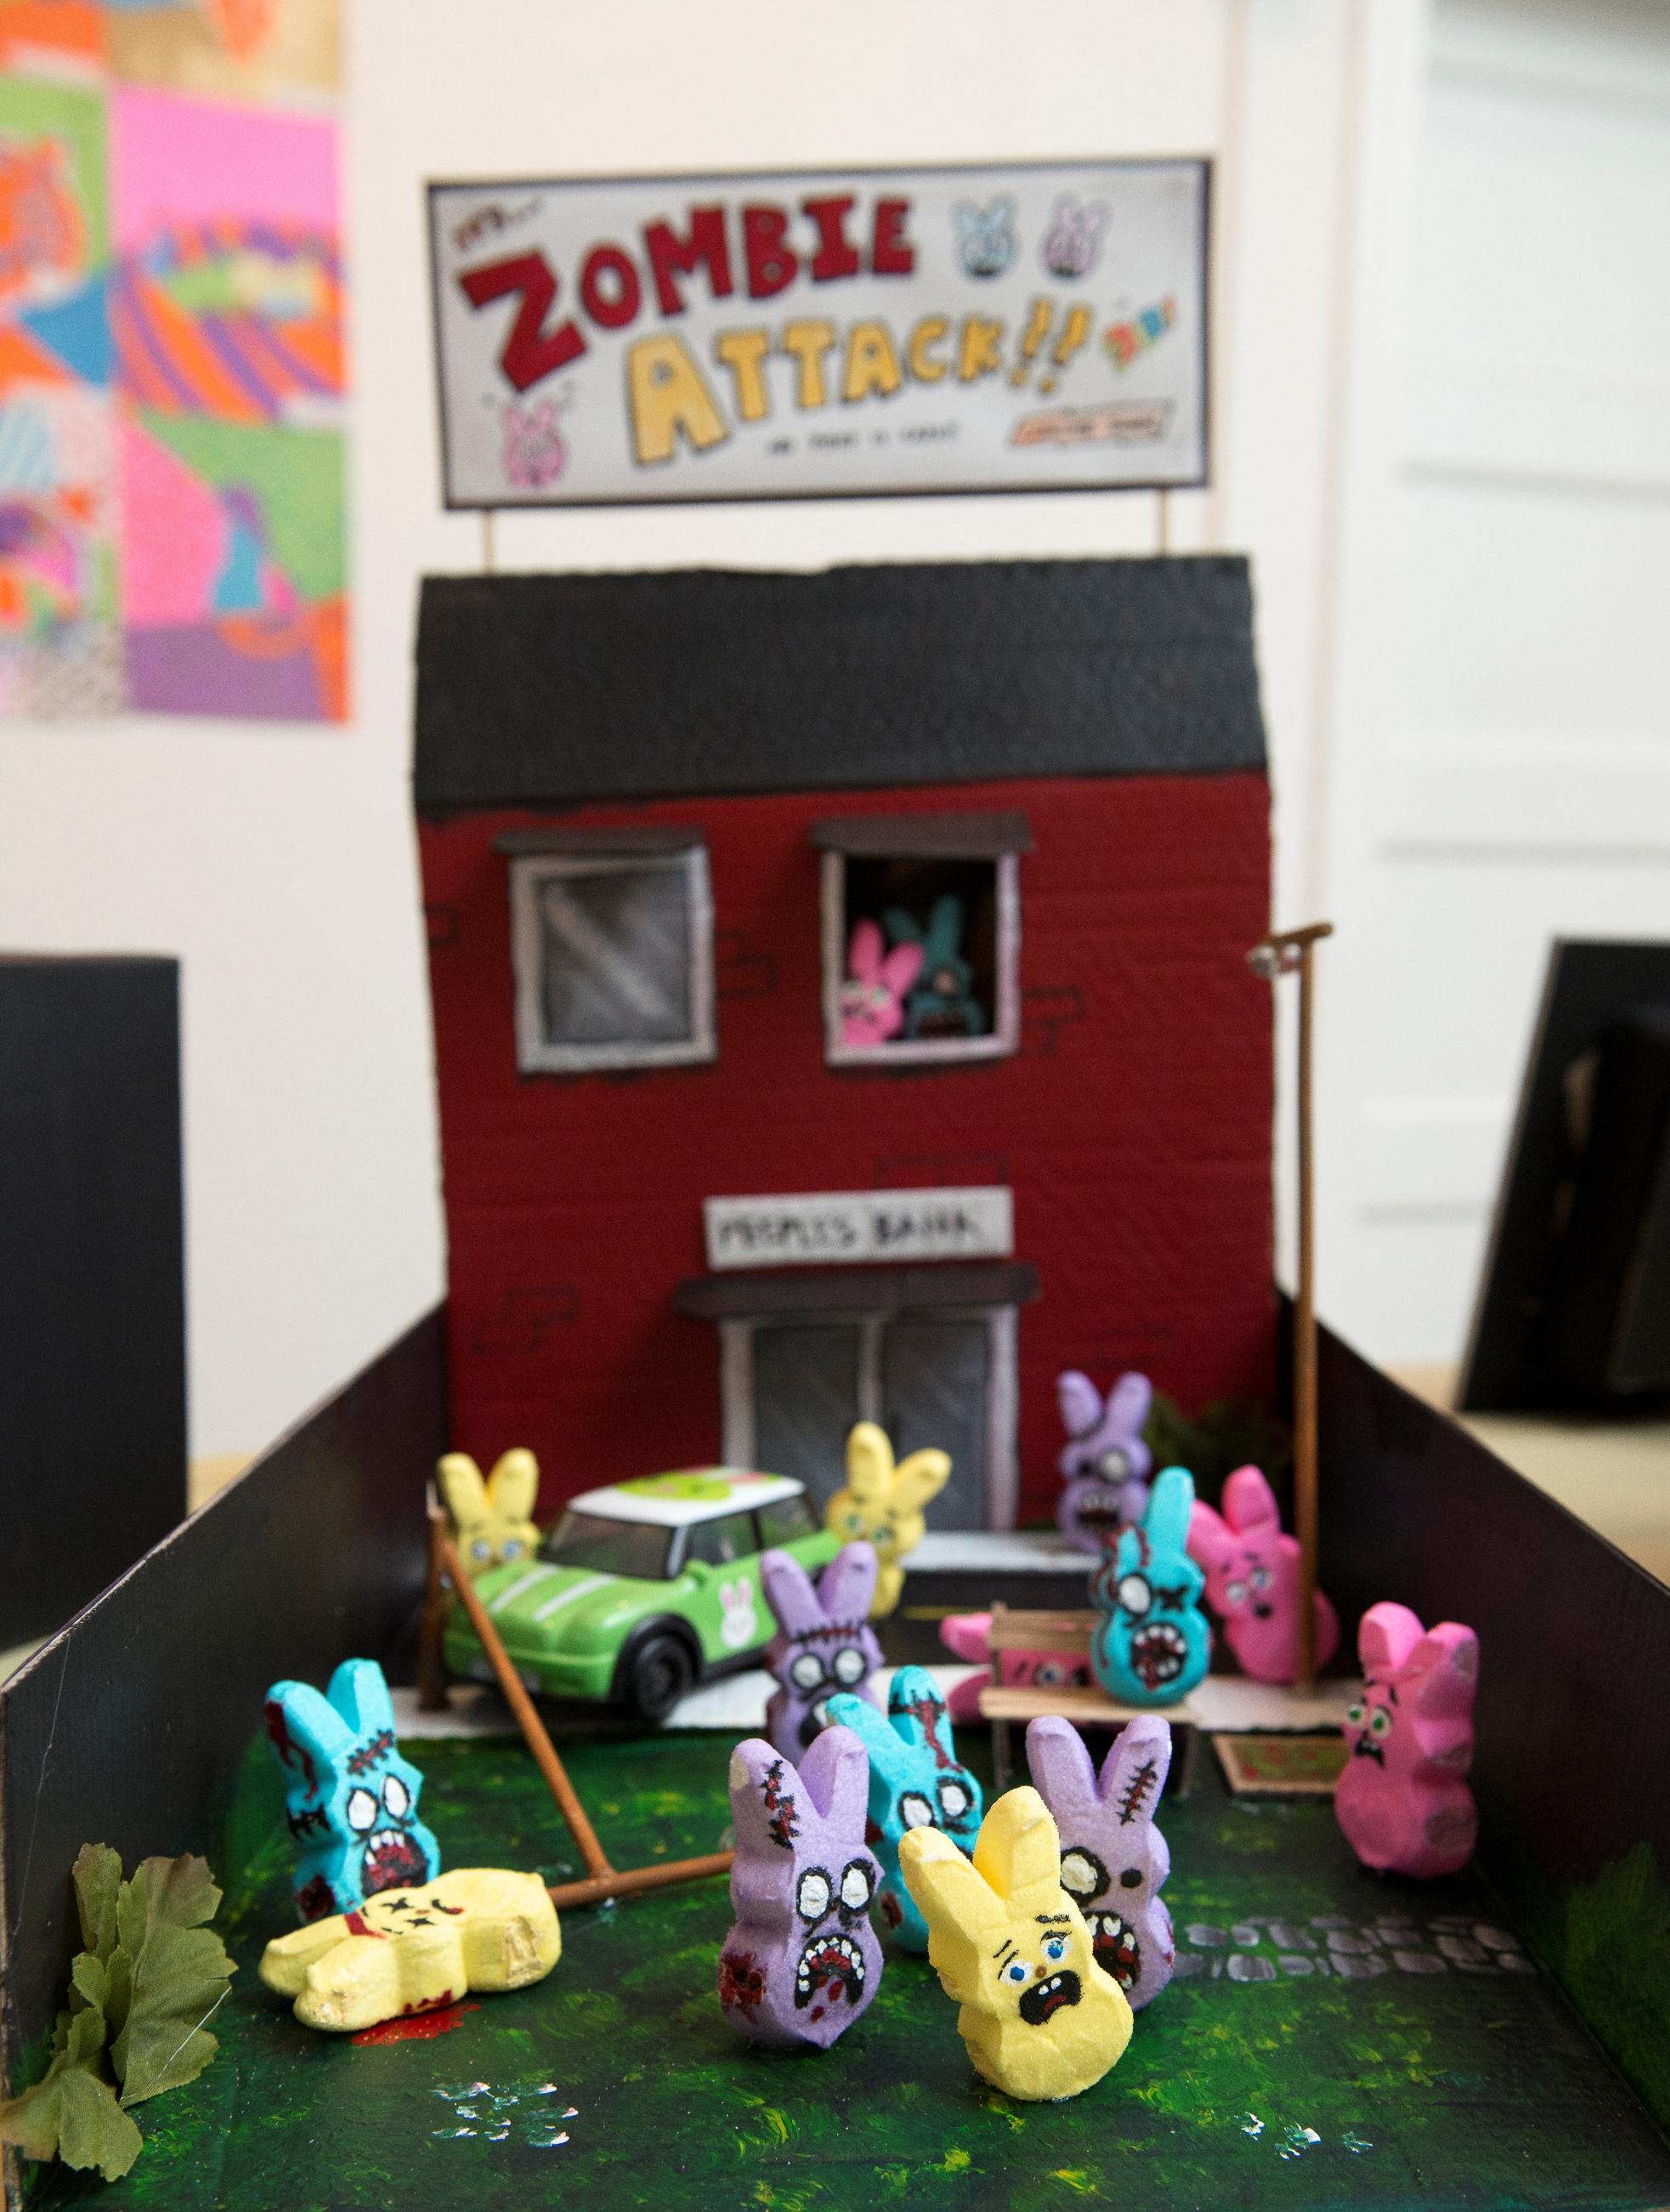 Library Arts Center Peeps Diorama Contest Peeps Zombie Attack! by Stephanie Zara